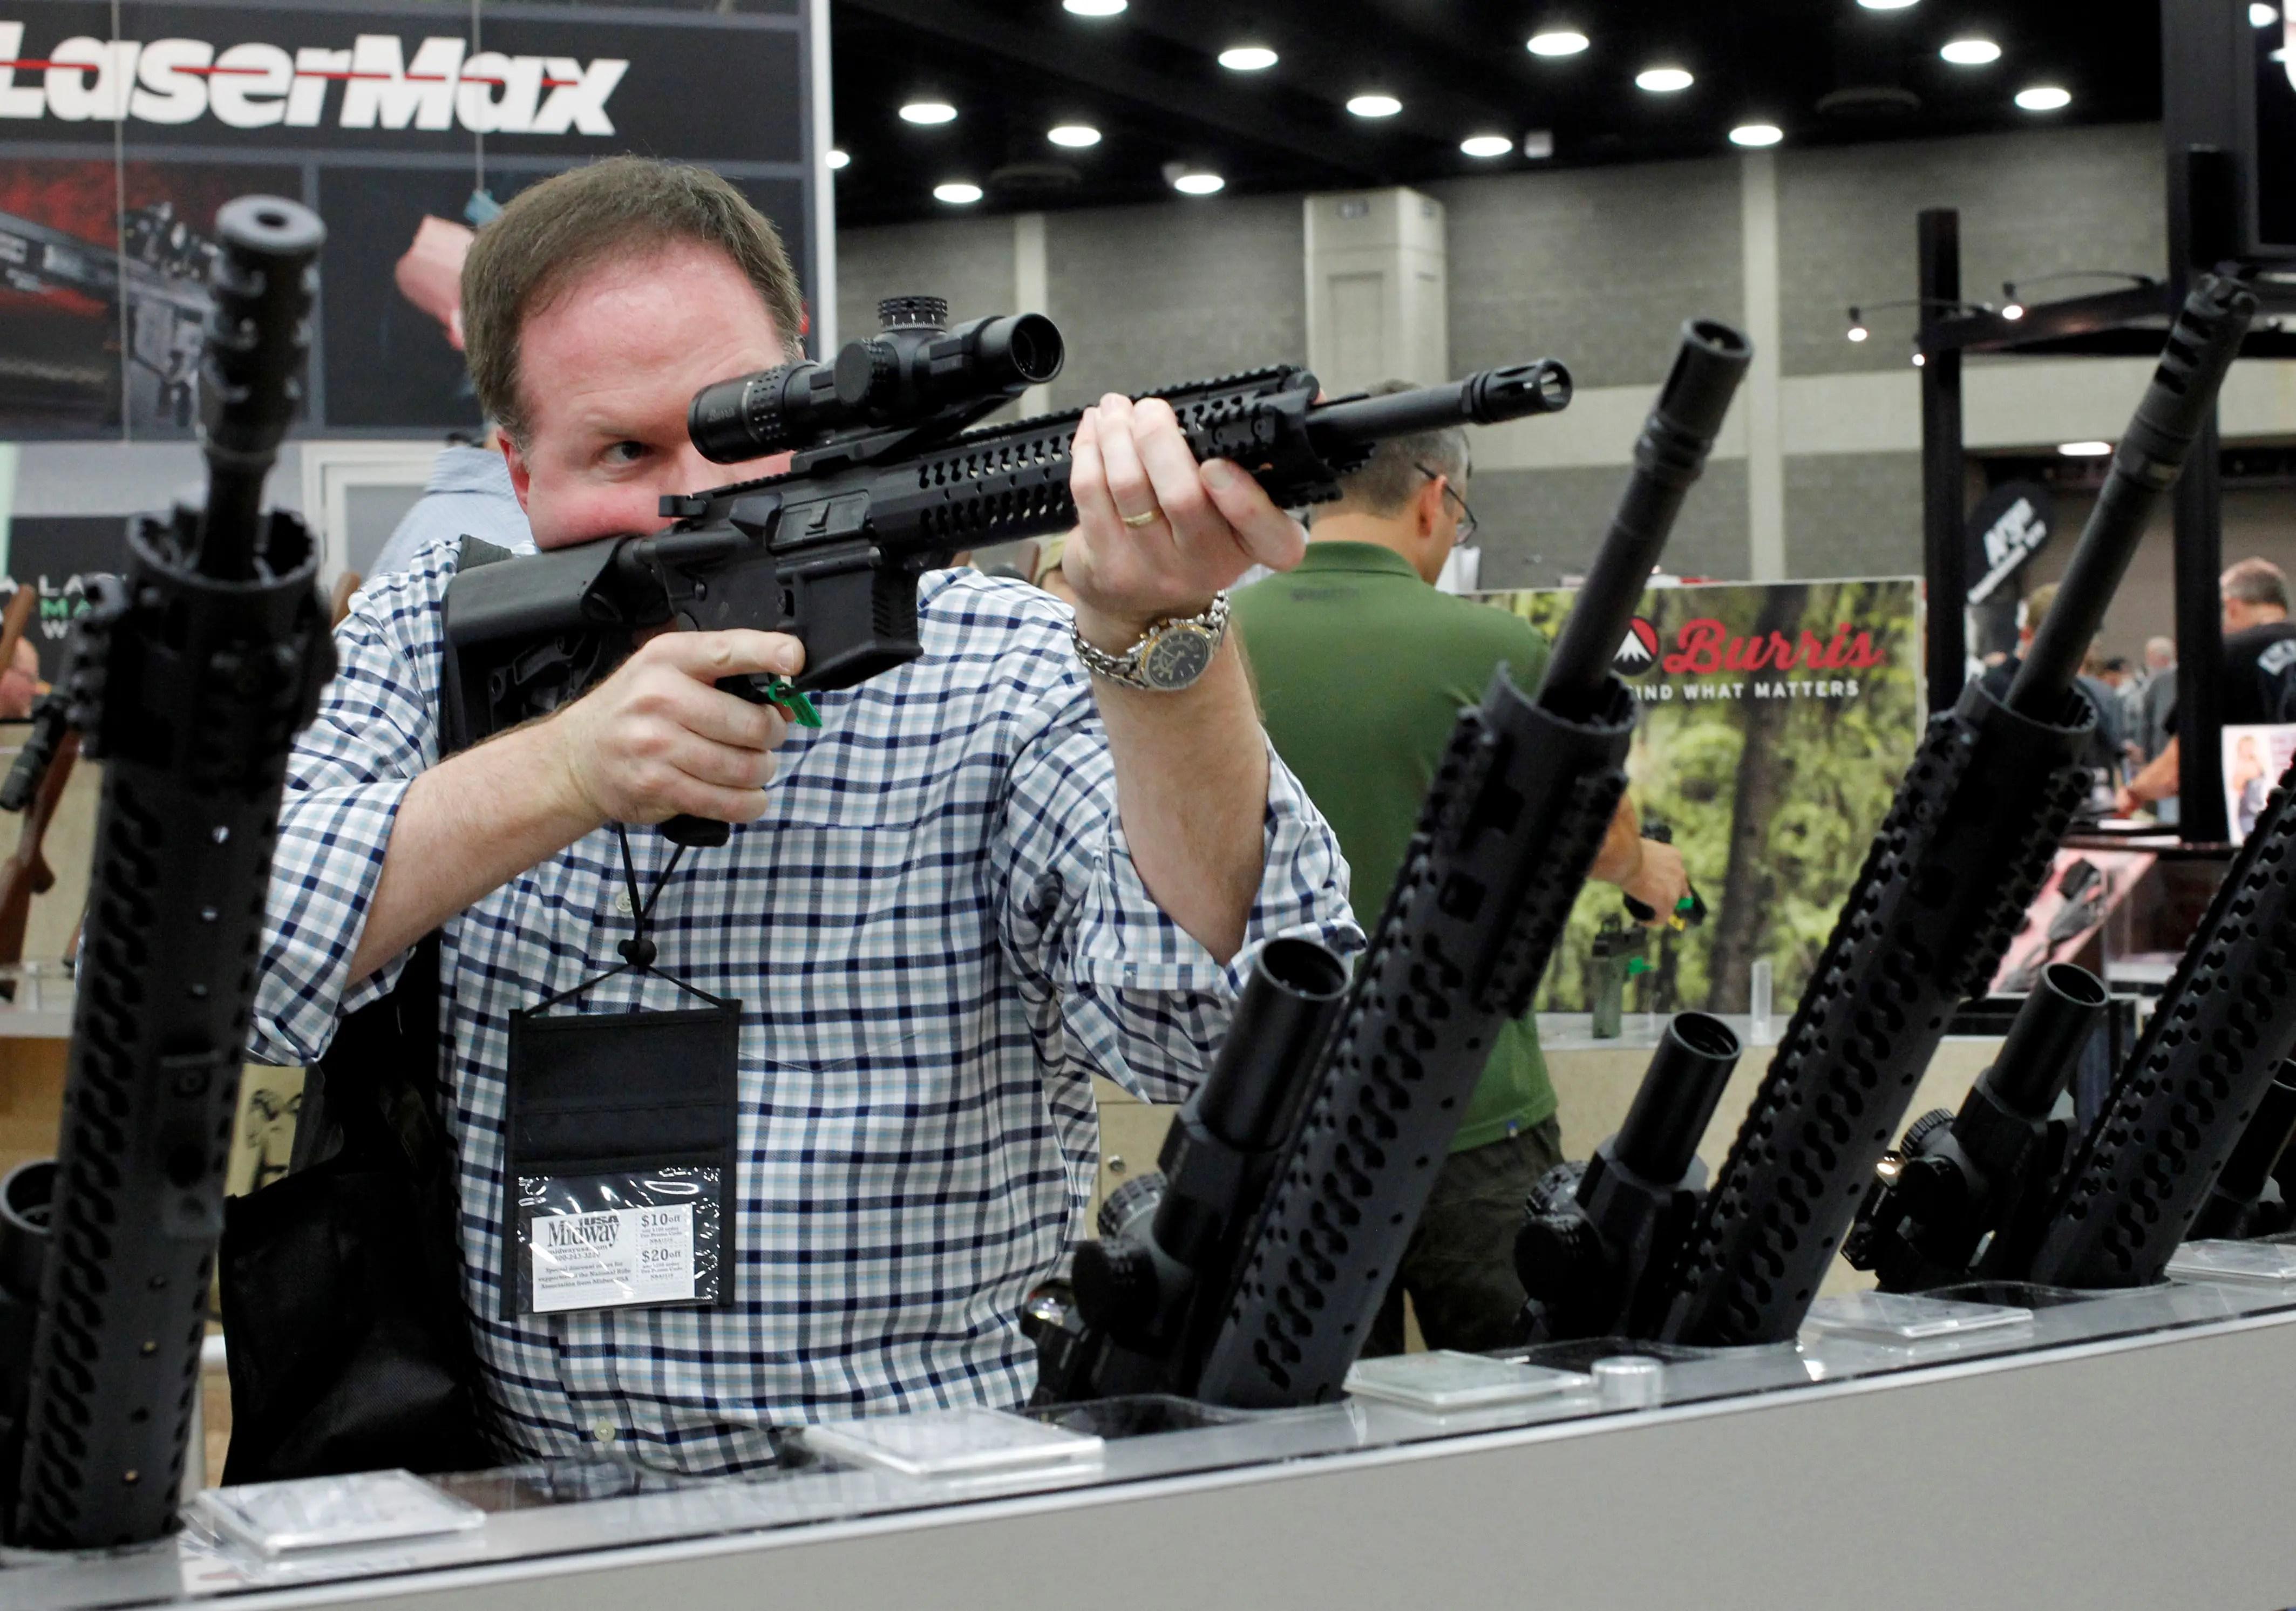 4 Specific Ways Gun Rights Could Change Under President